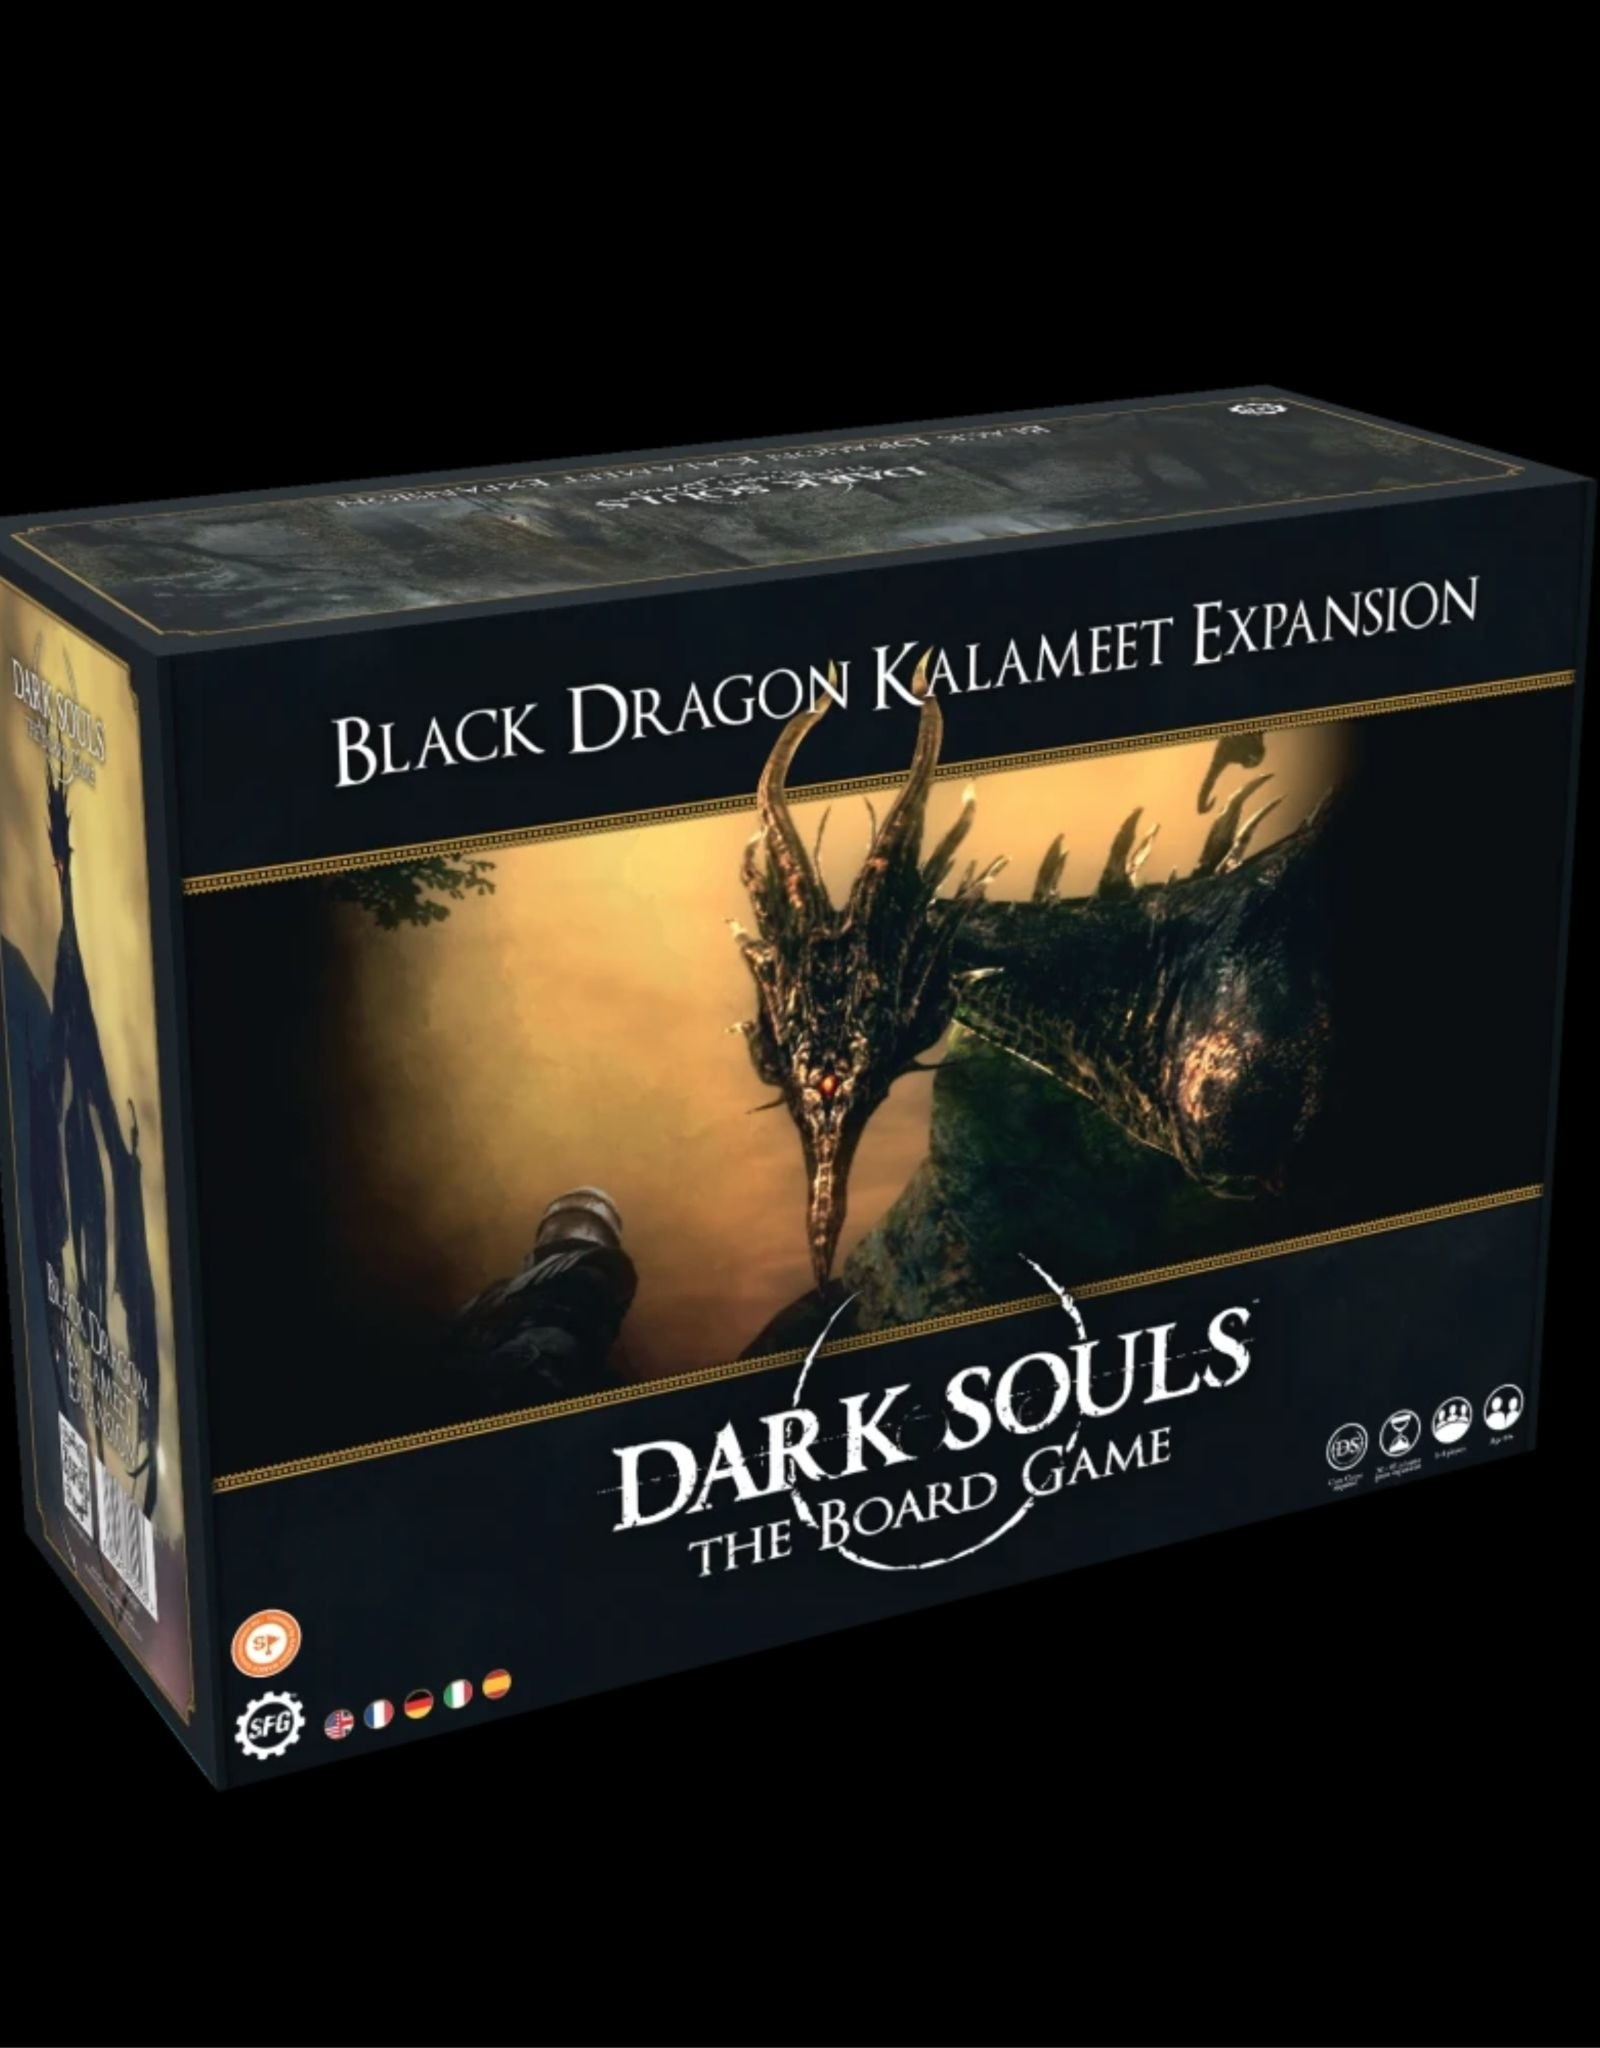 Dark Souls Dark Souls TBG:  Black Dragon Kalameet